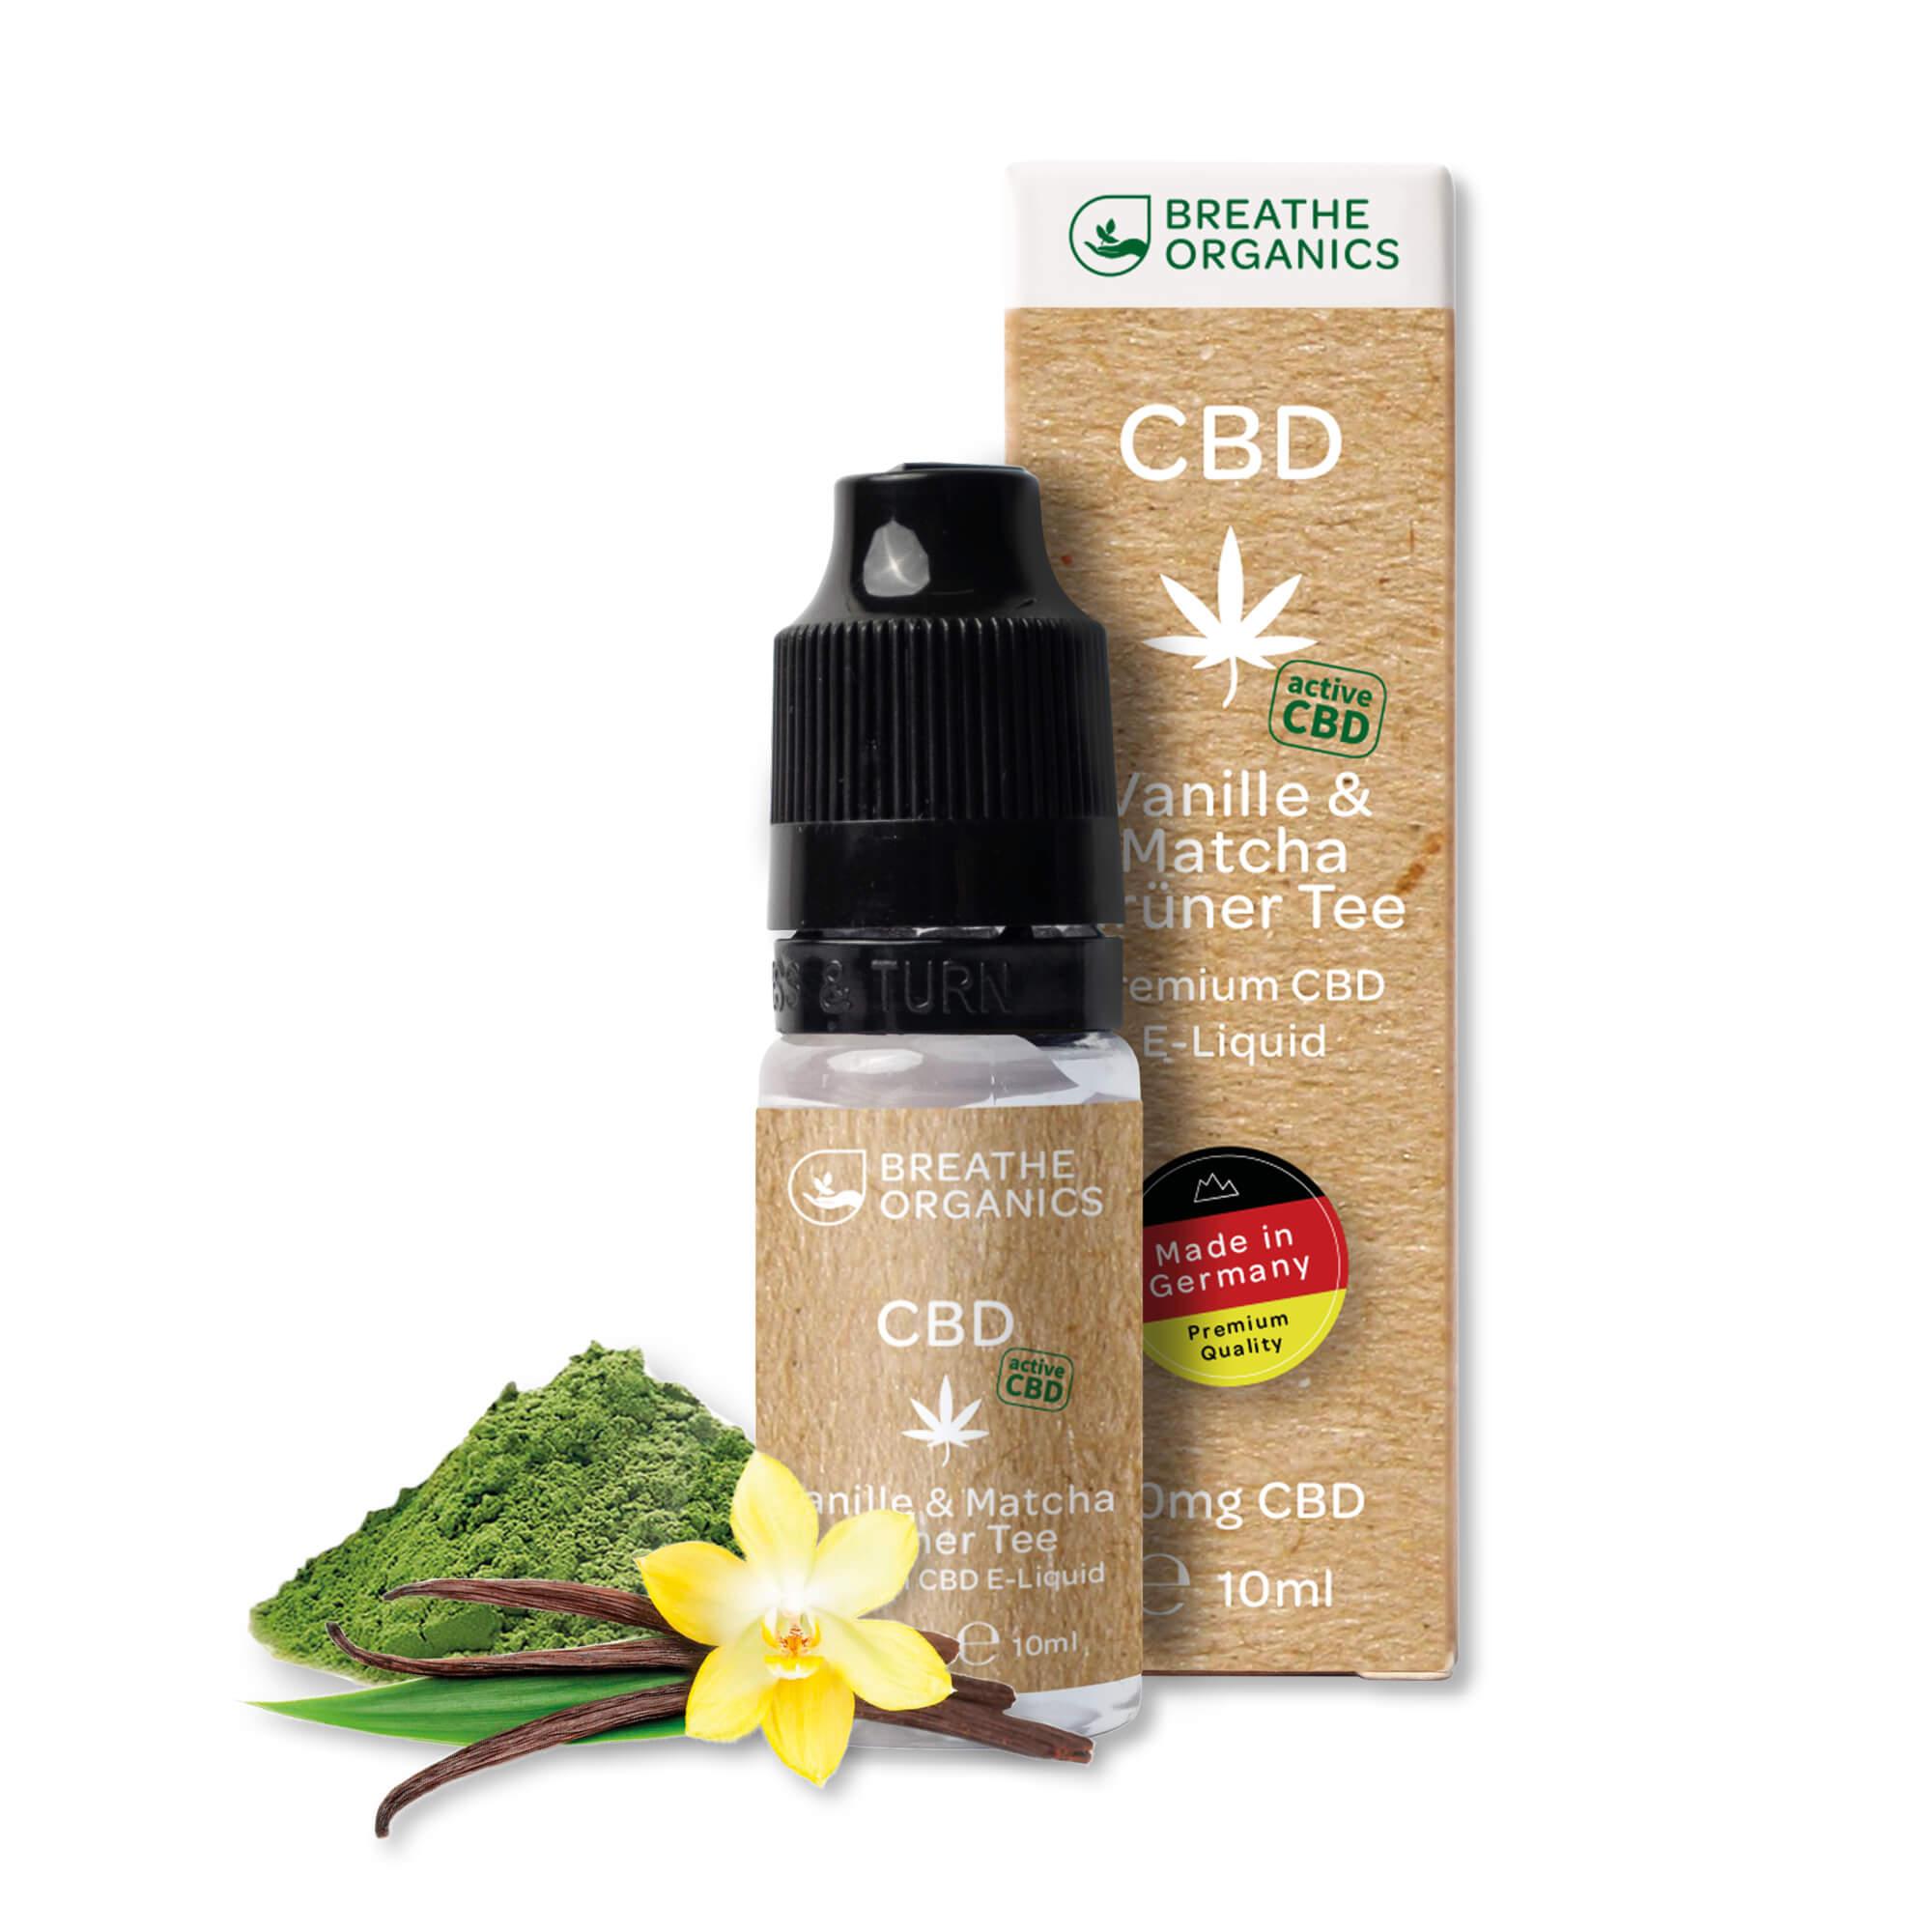 Breathe Organics - activeCBD Liquid Vanille & Matcha Grüner Tee 600mg